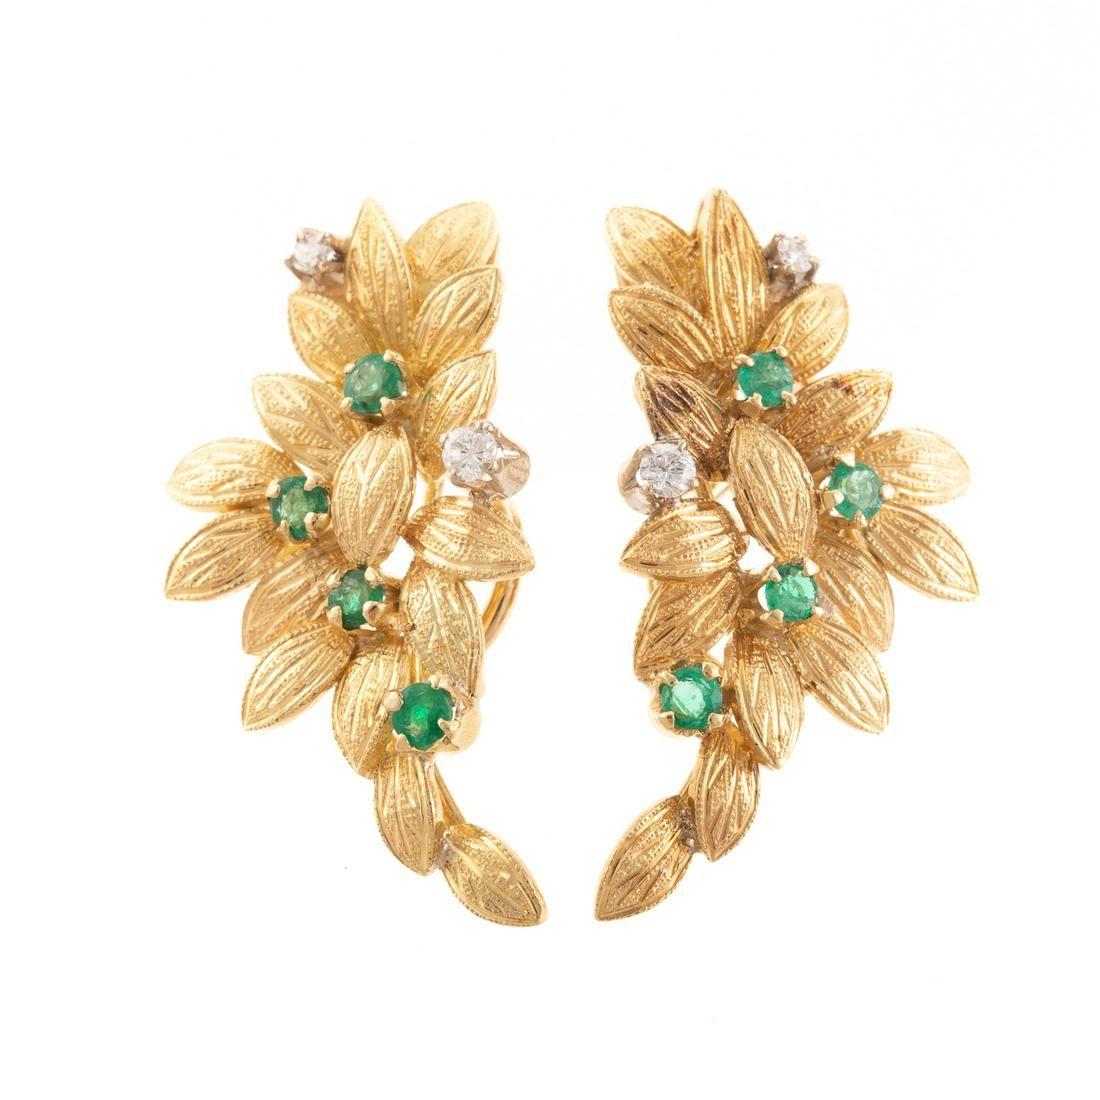 A Pair of Emerald & Diamond Handmade Earrings